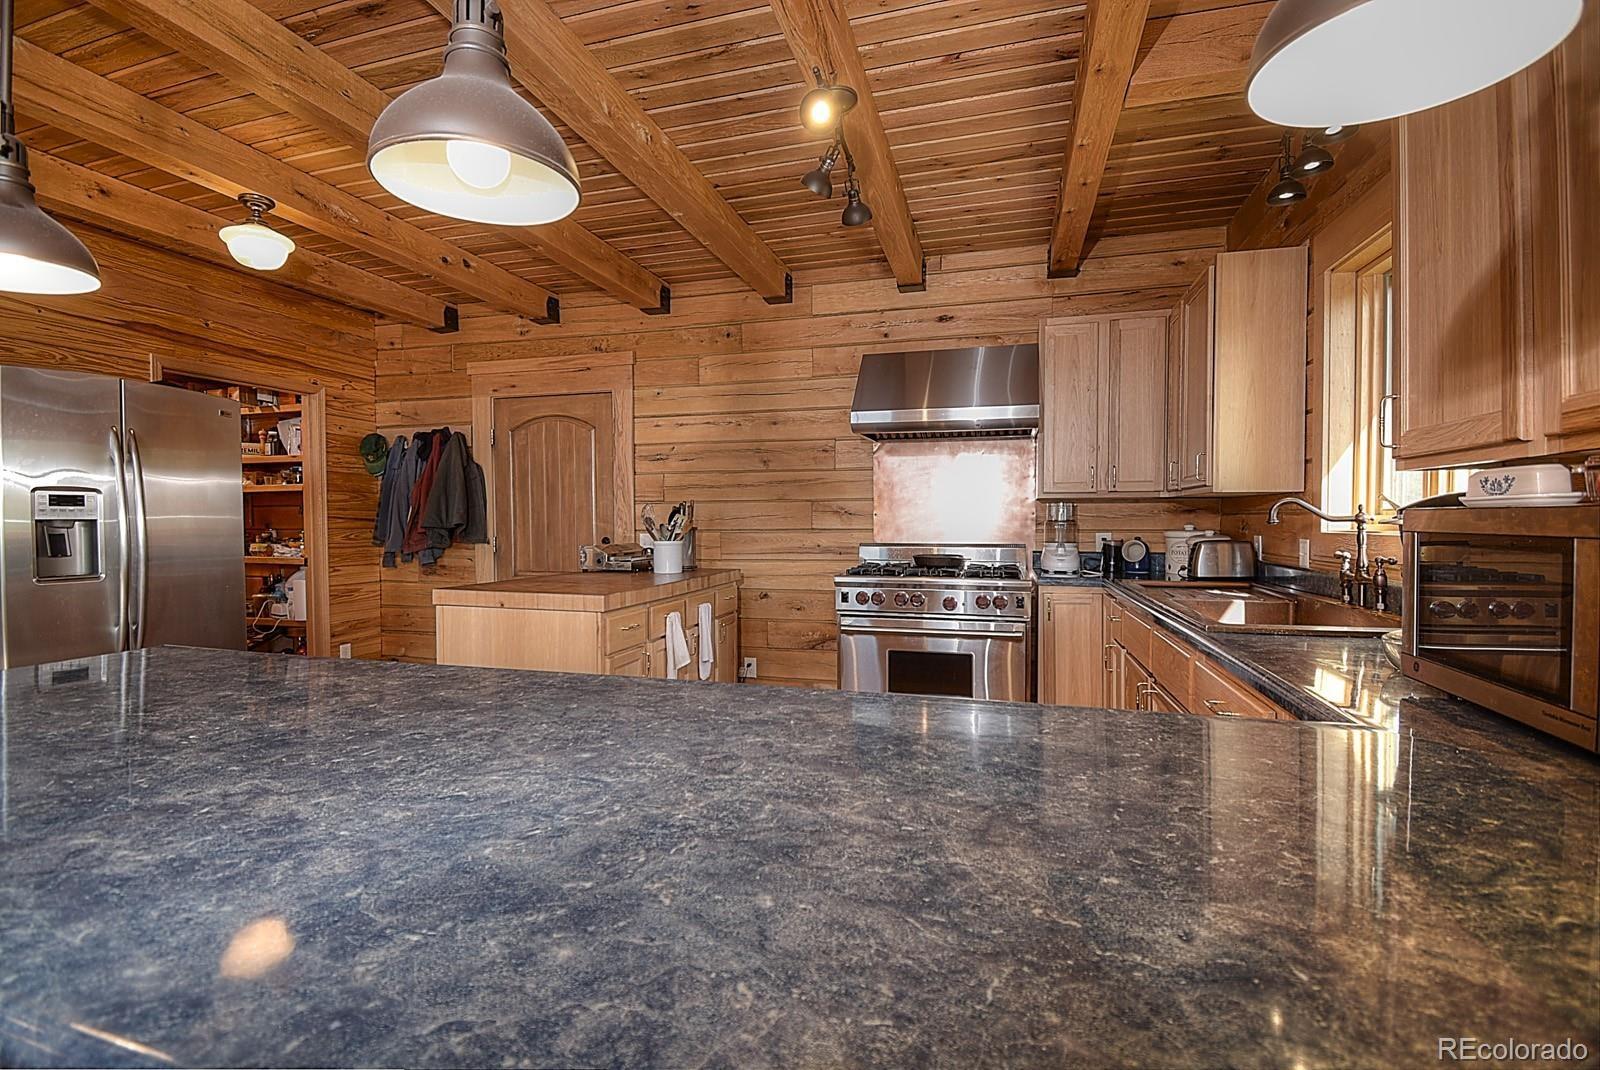 MLS# 8182693 - 11 - 396 Eagle Nest Trail, Guffey, CO 80820